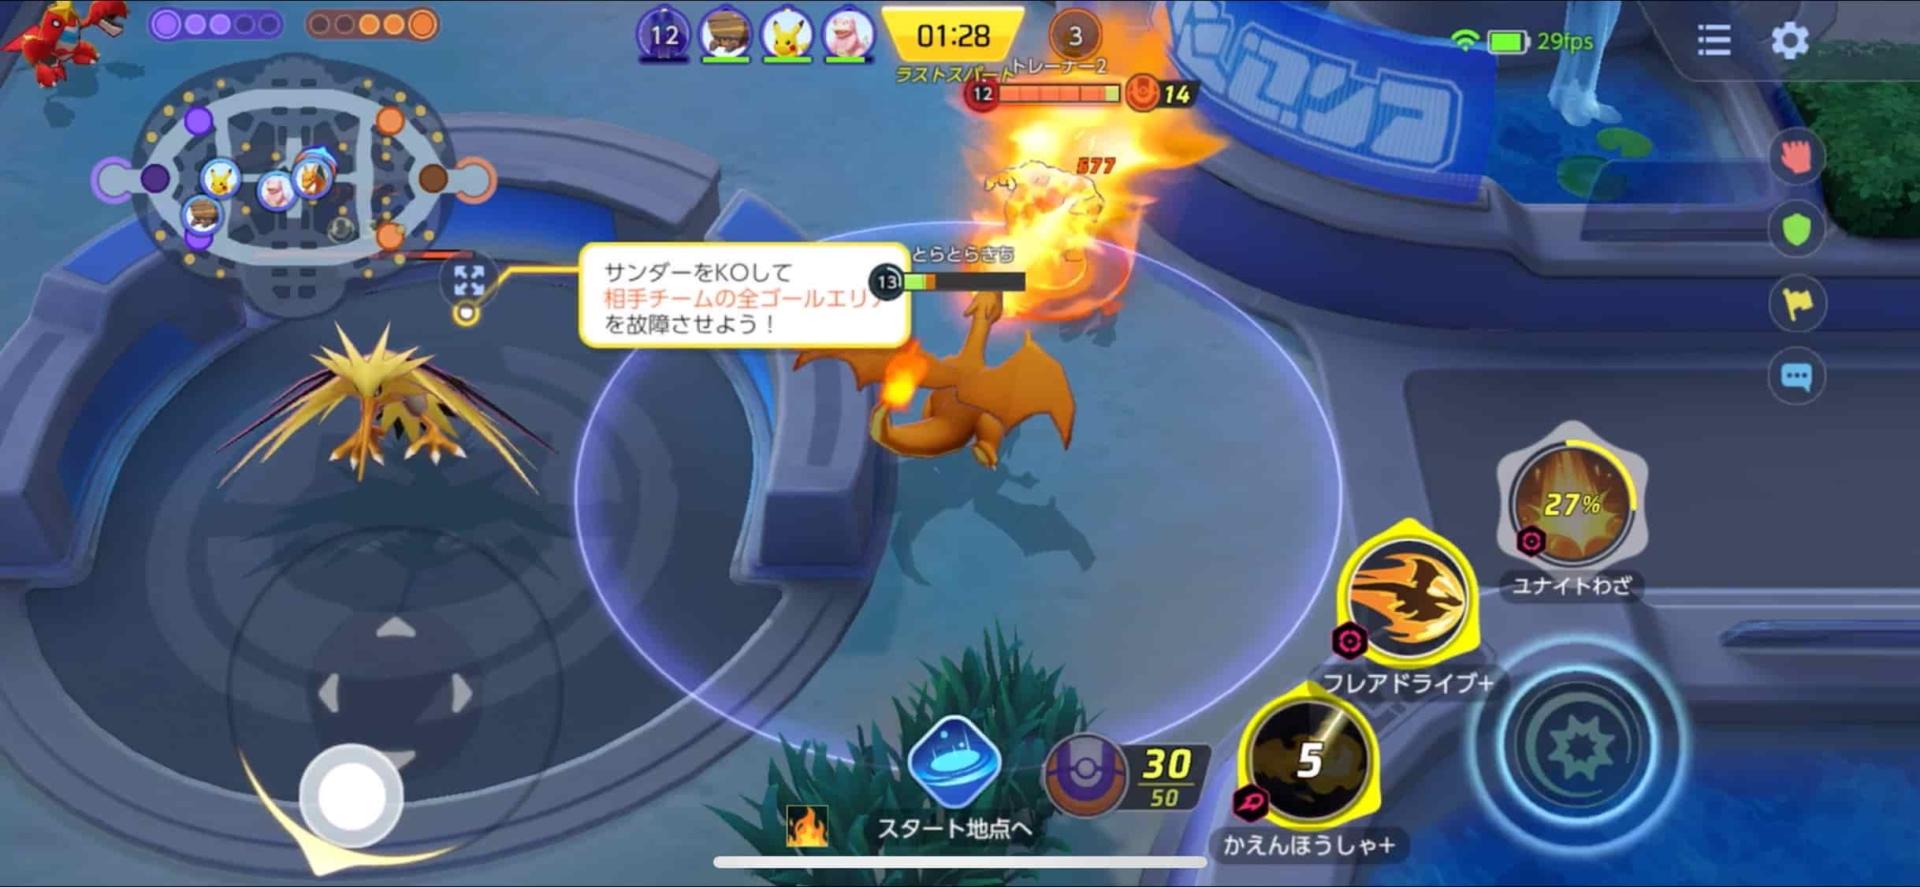 Pokémon UNITE(ポケモンユナイト)の序盤攻略